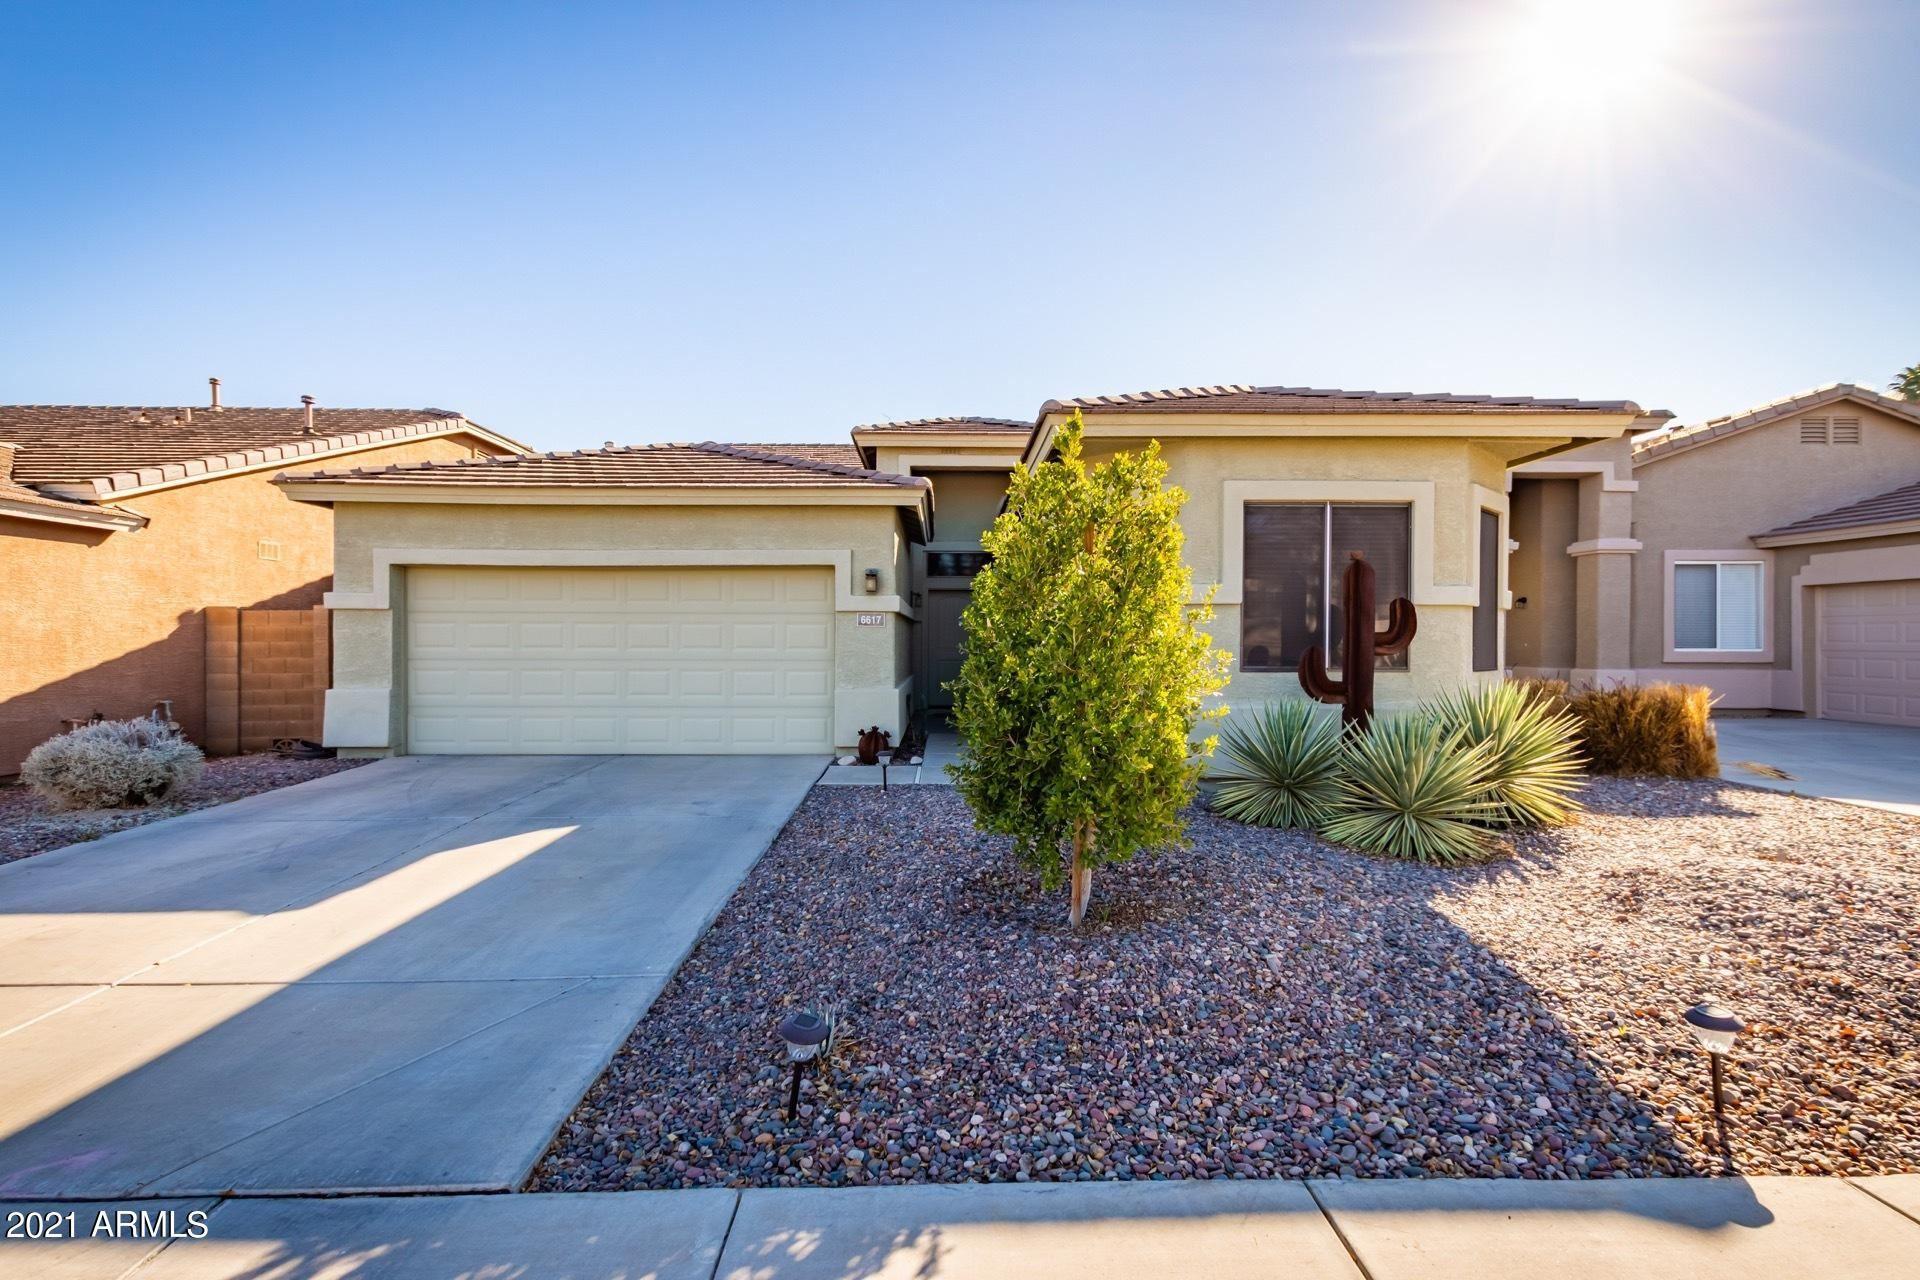 Photo of 6617 S 5TH Way, Phoenix, AZ 85042 (MLS # 6199315)